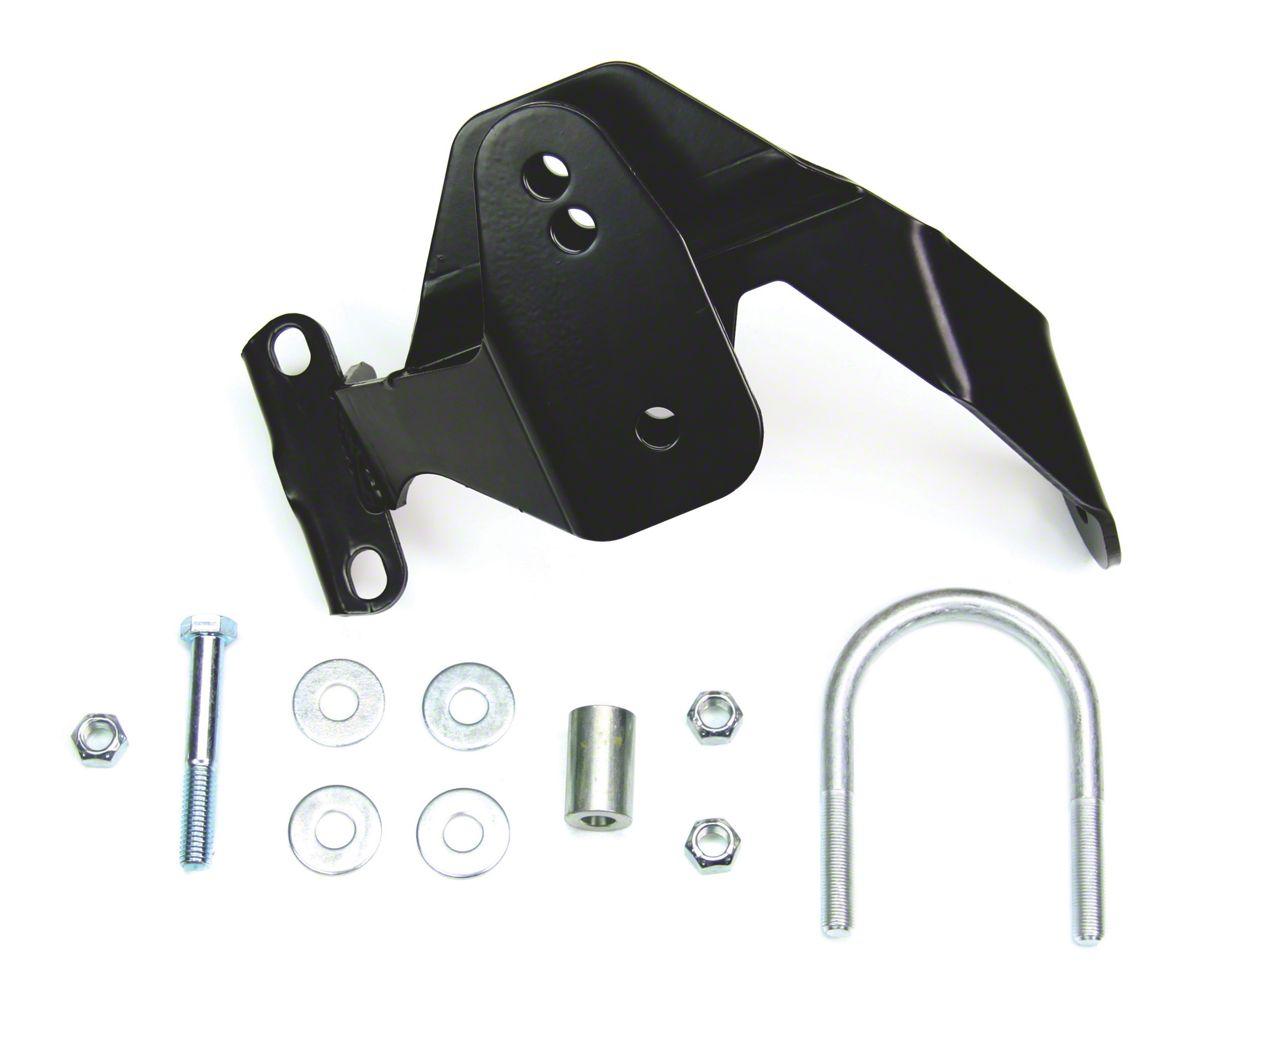 Teraflex Rear Track Bar Axle Bracket for 2.5 in. Lift - Right Hand Drive (07-18 Jeep Wrangler JK)